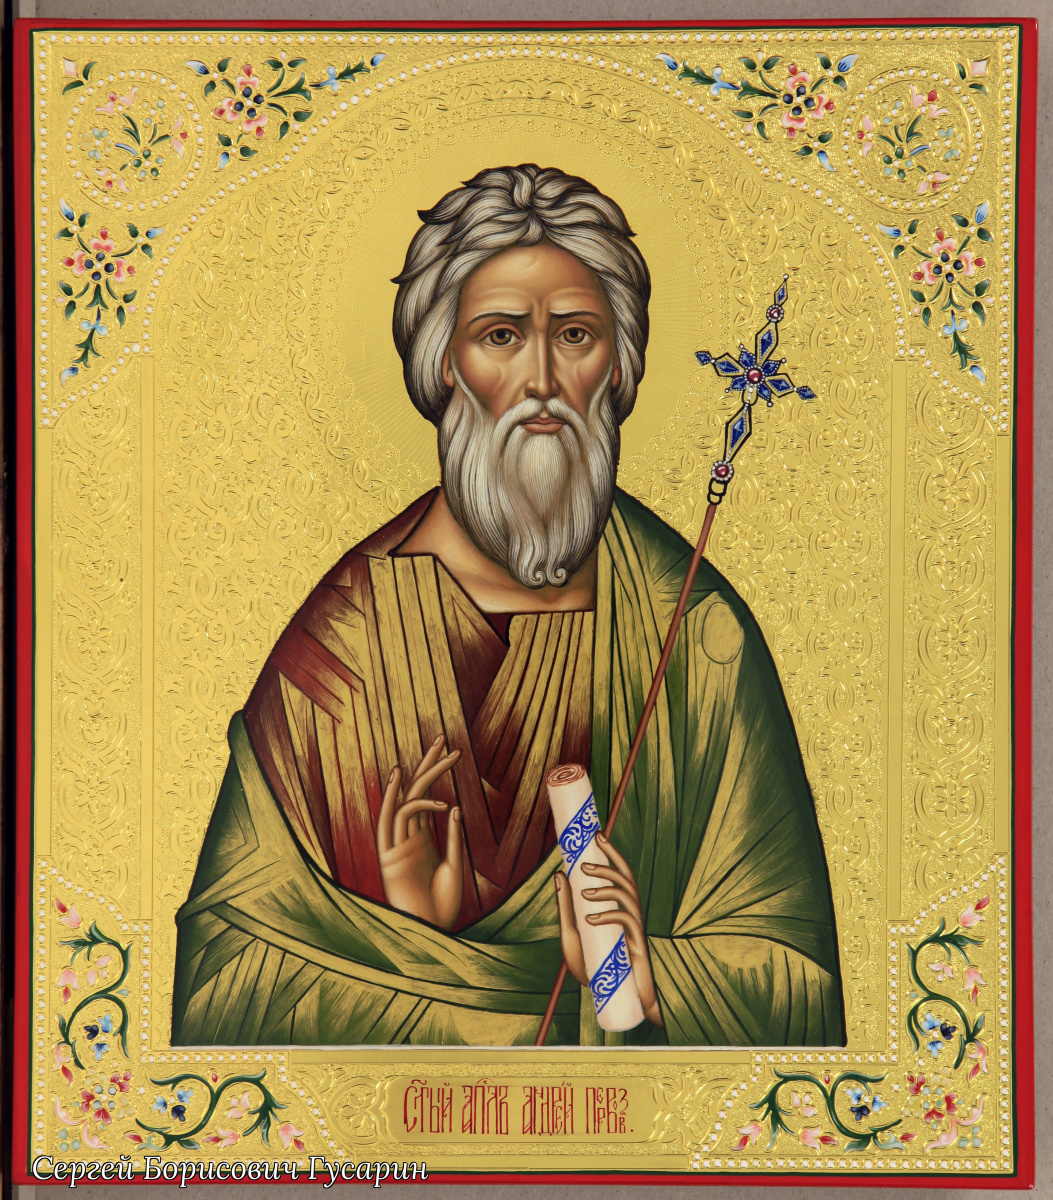 Sergey Borisovich Gusarin. Св.апостол Андрей Певозванный